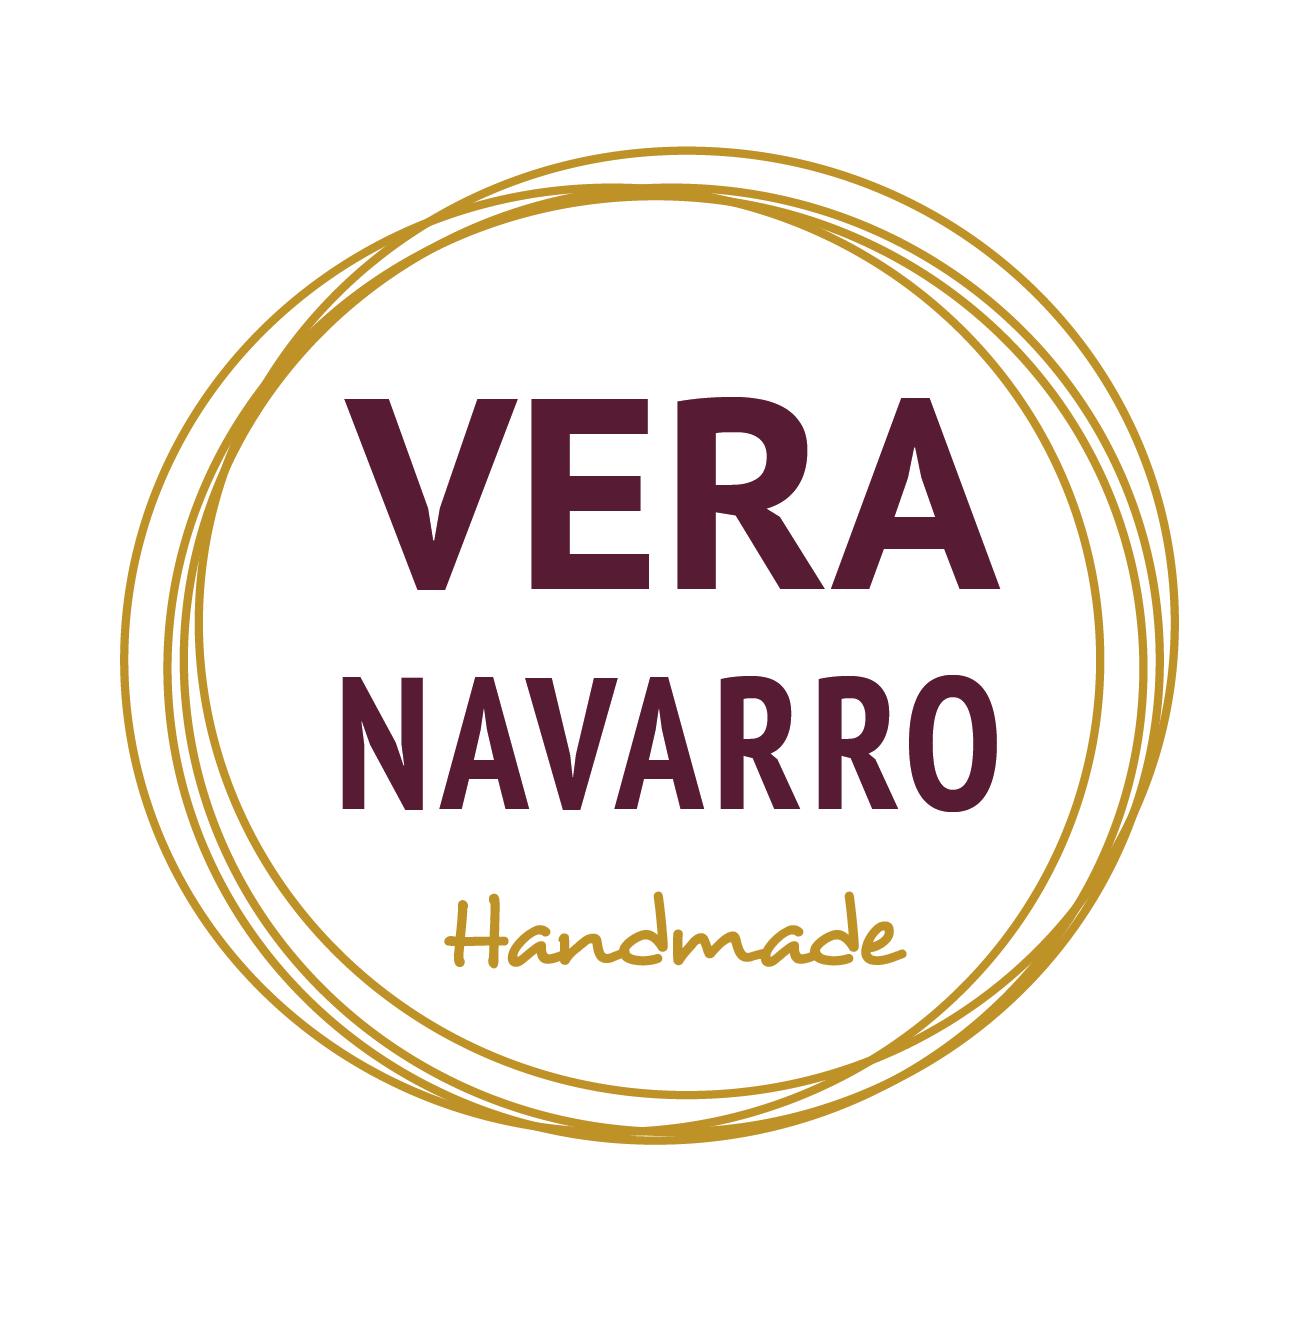 Vera Navarro